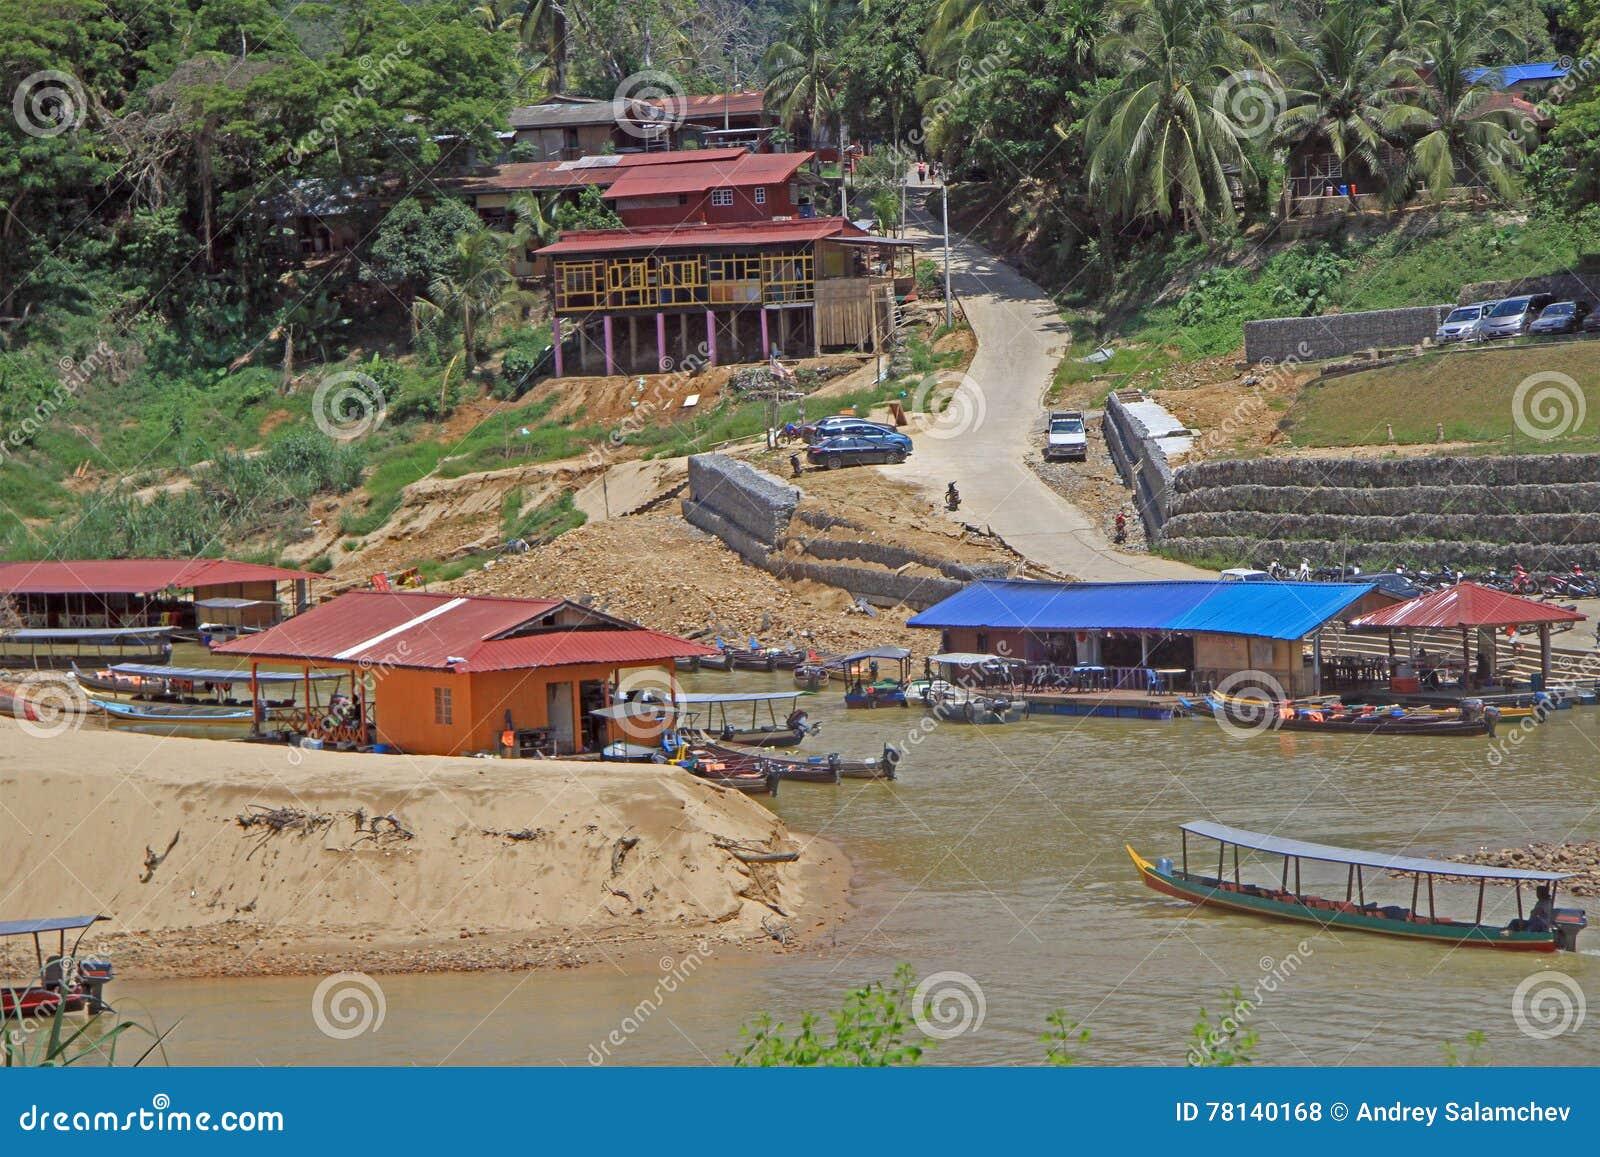 Tourist boats on Tembeling river in Taman Negara National Park